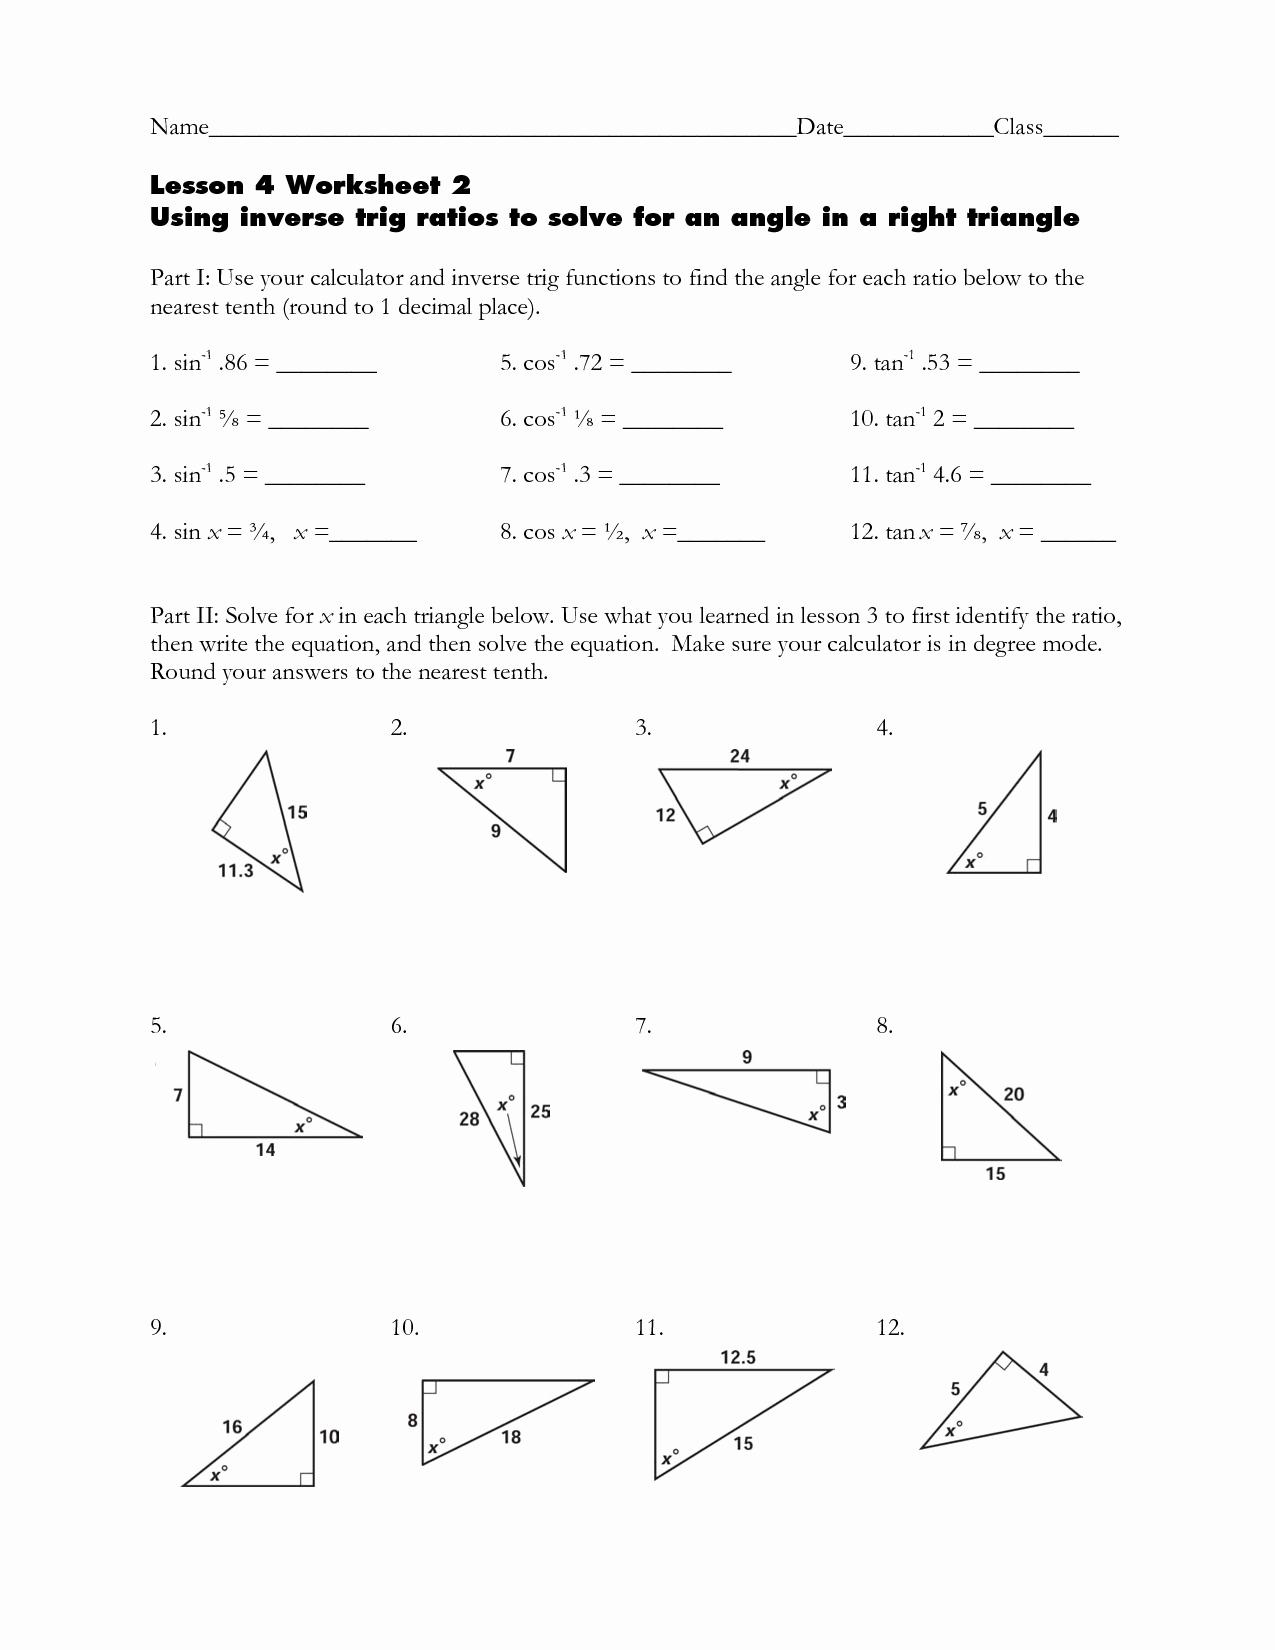 50 Inverse Trigonometric Functions Worksheet